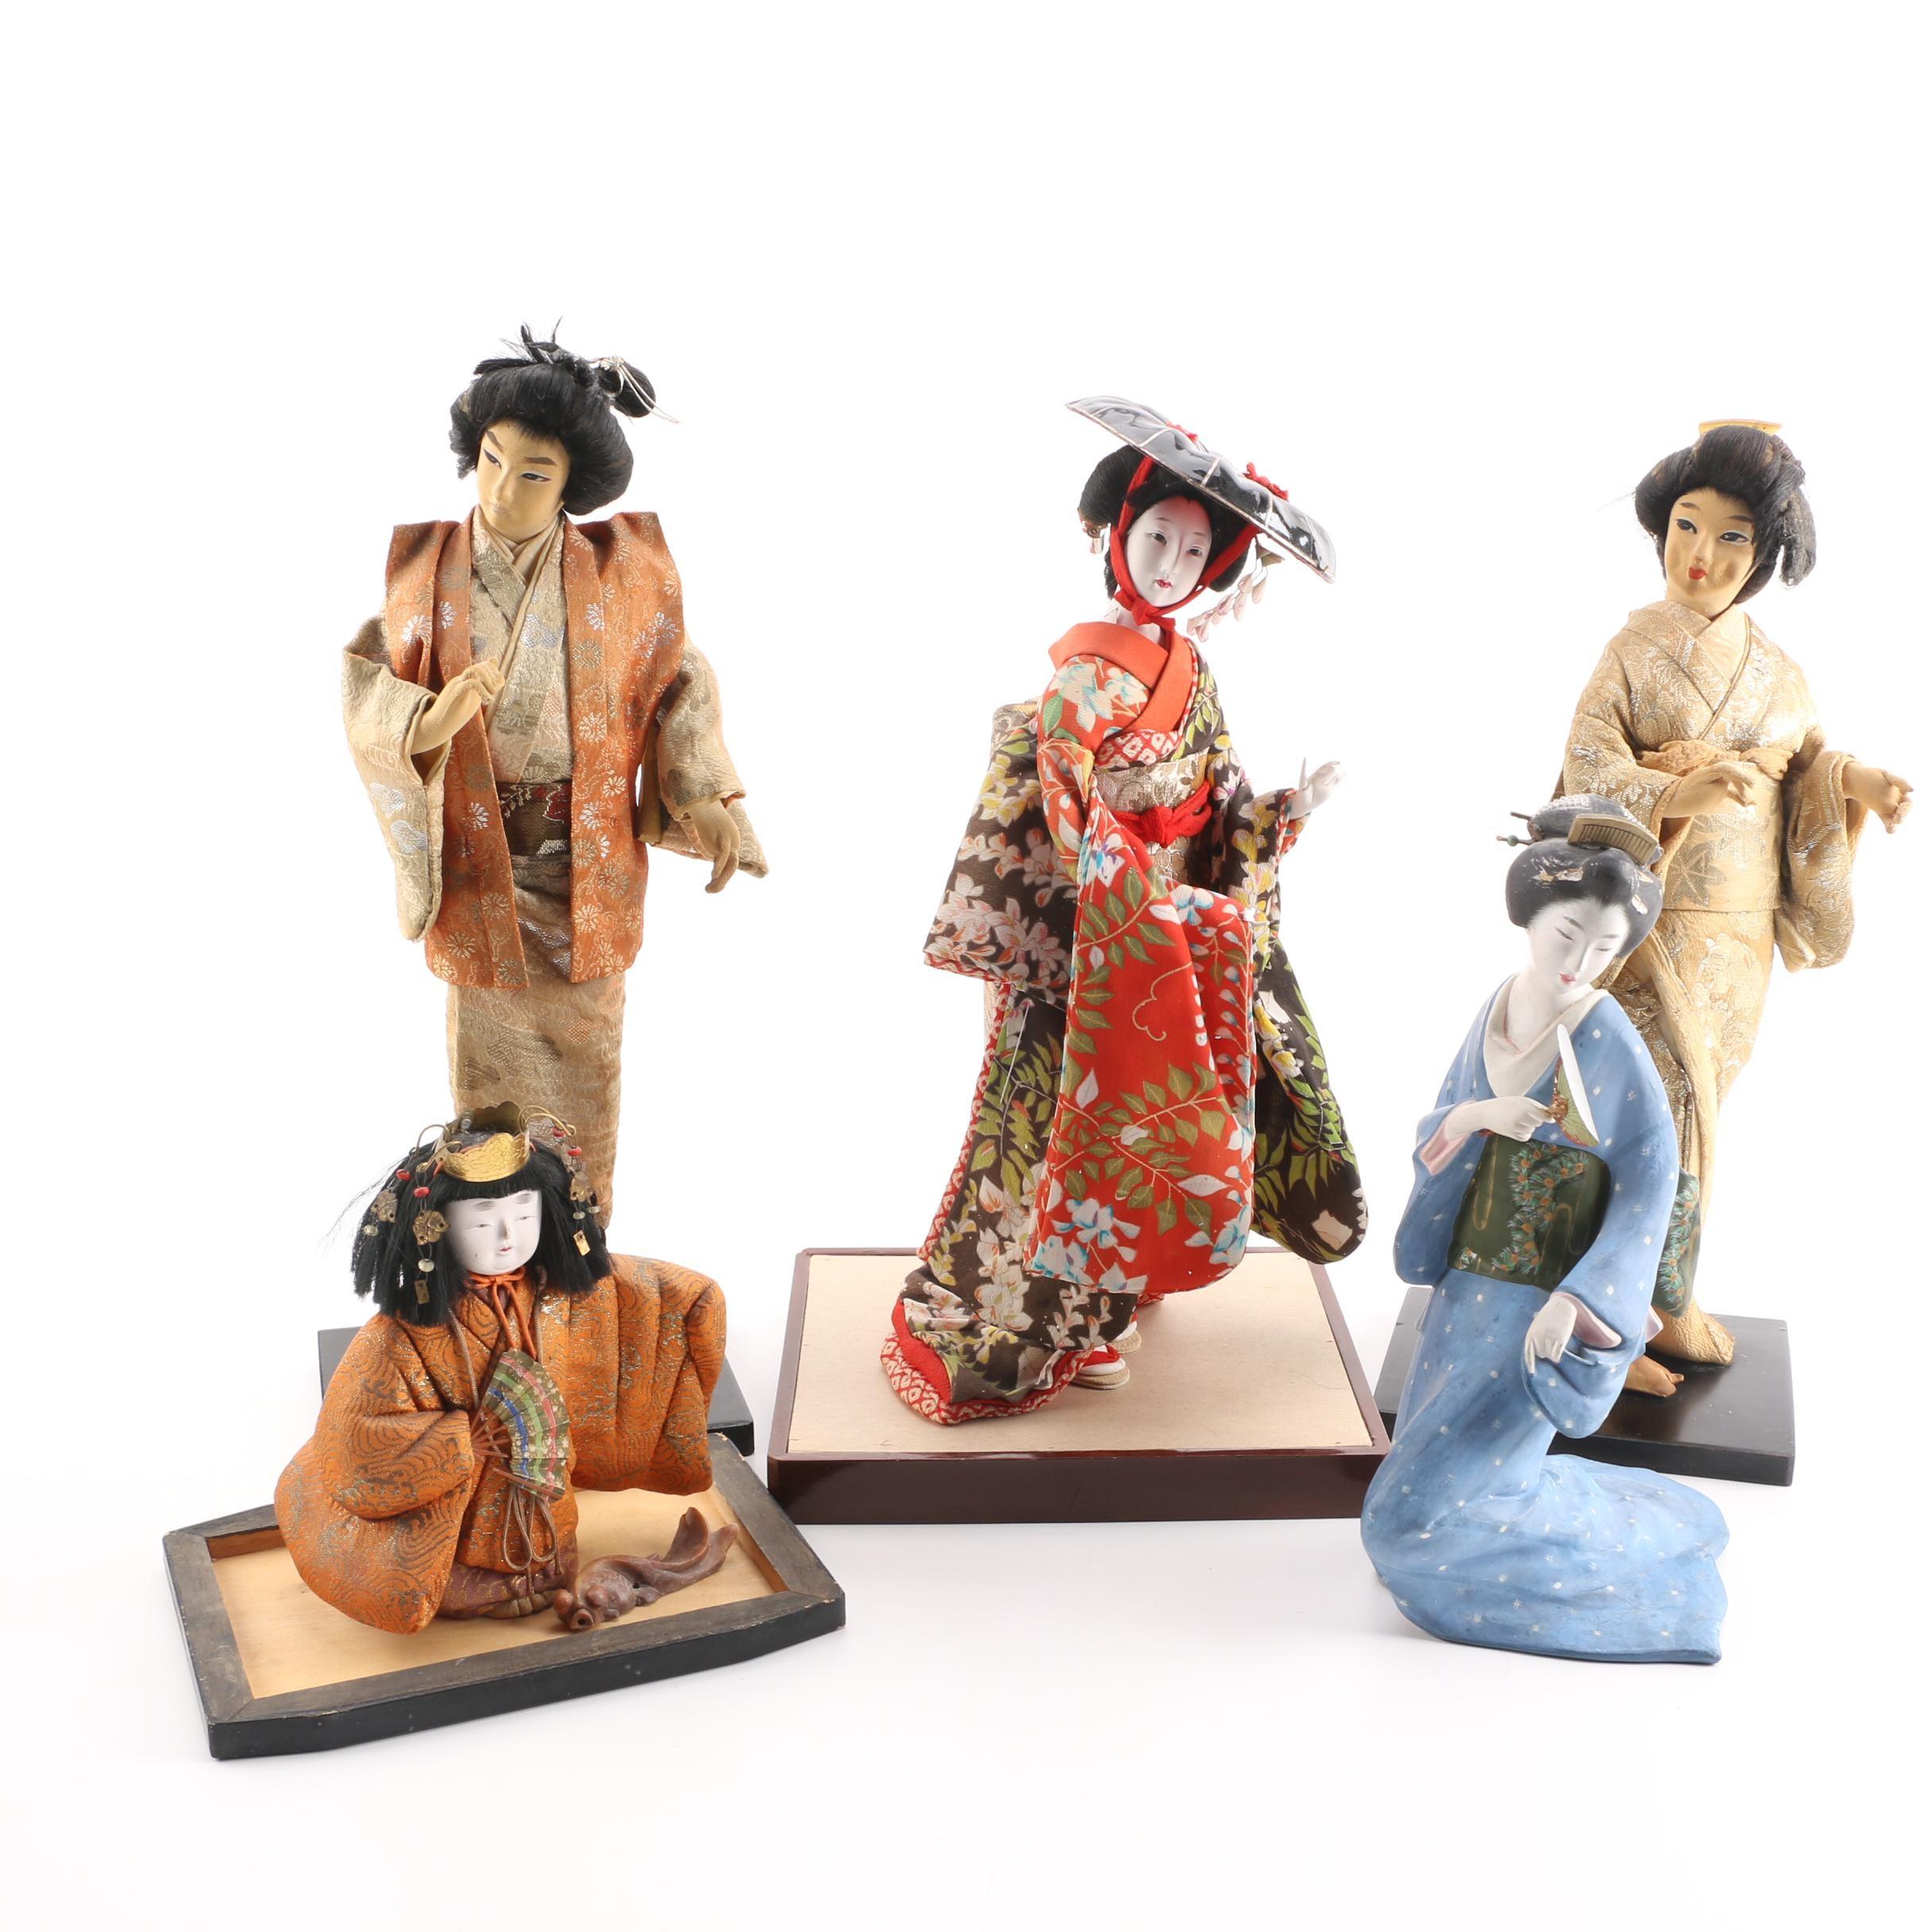 Vintage Japanese Folk Art and Souvenir Dolls